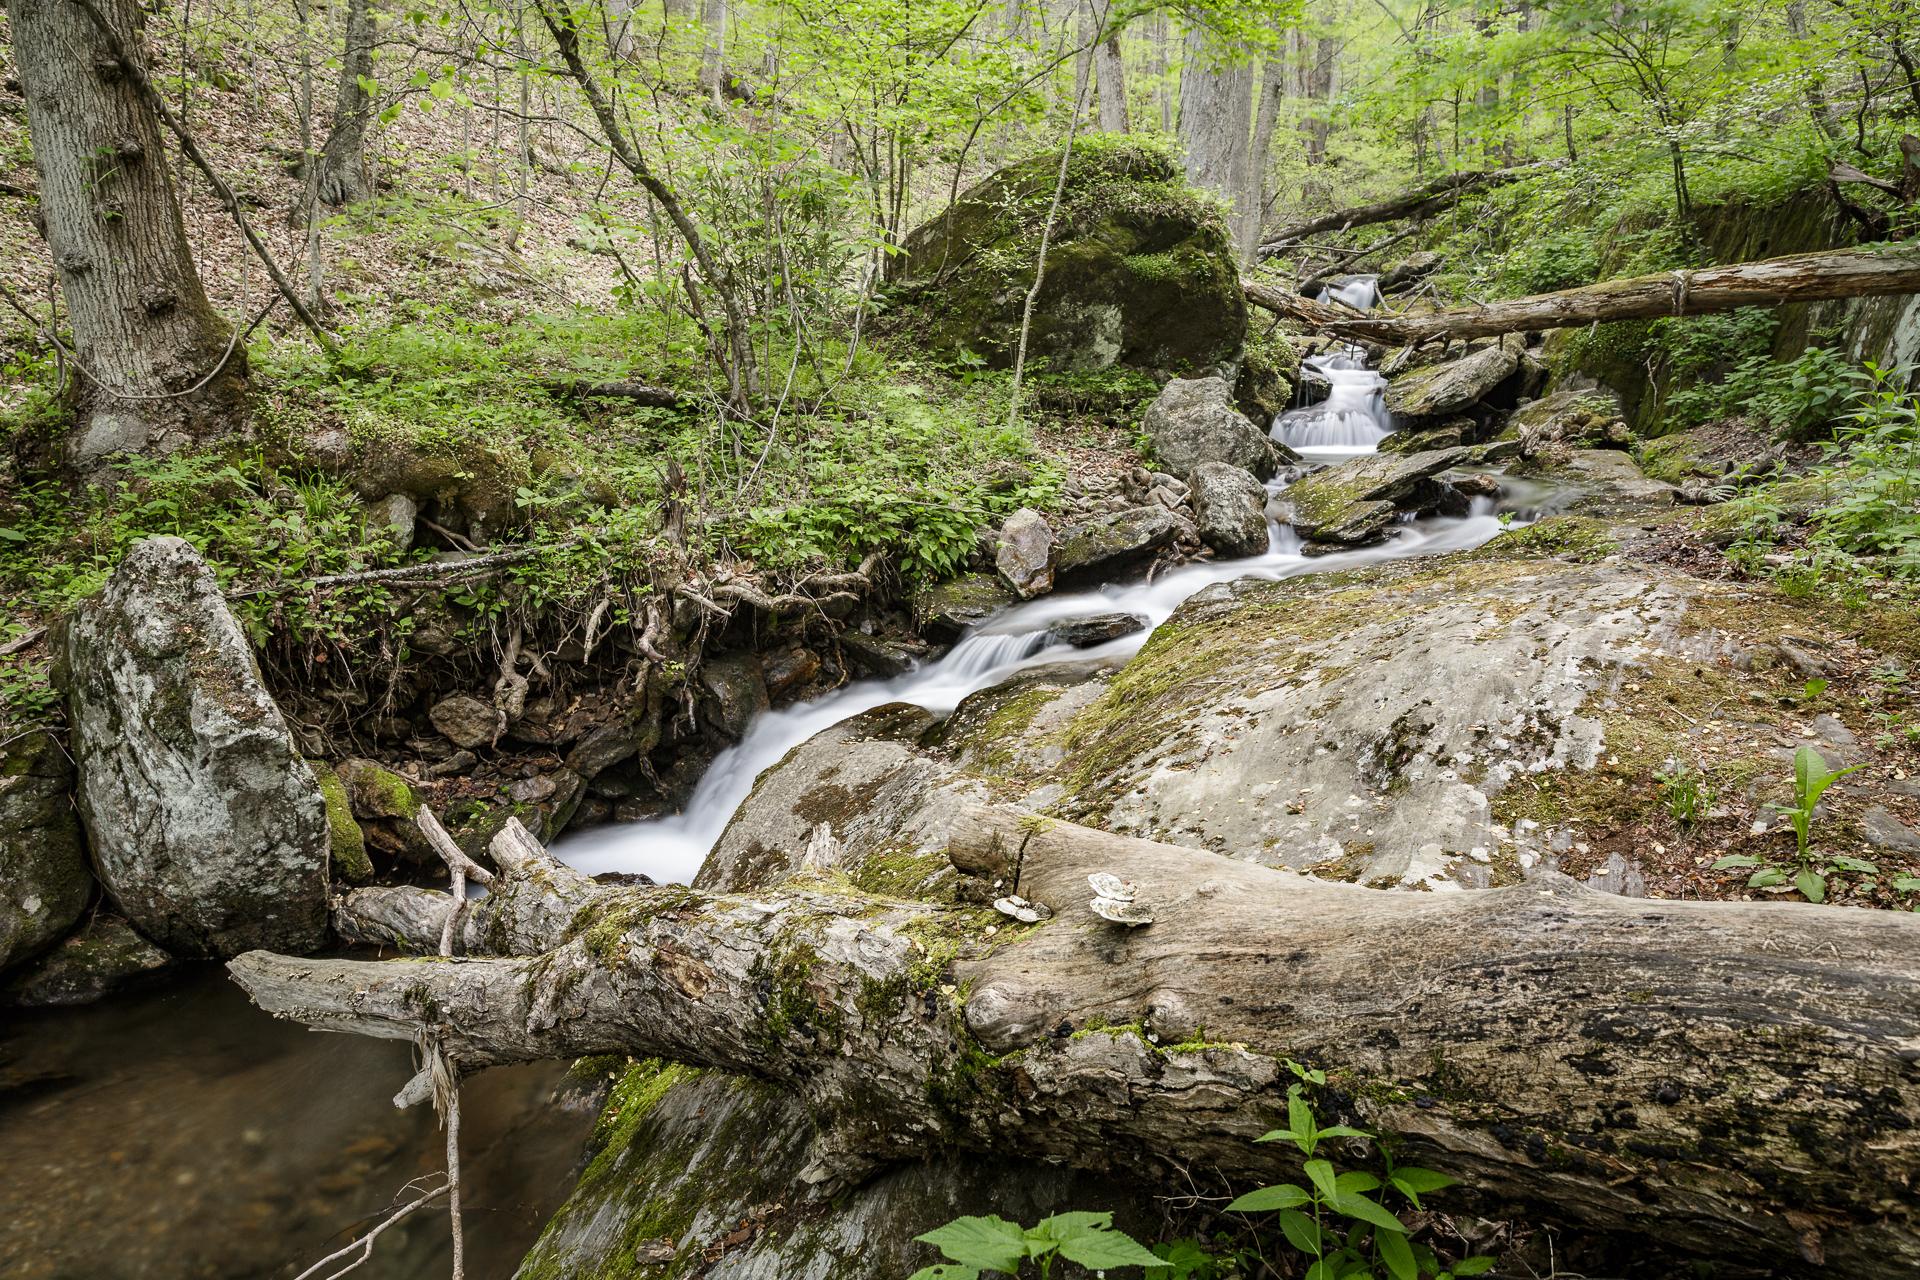 walker-falls-in-the-pisgah-national-forest-Kathleen-Kathy-Roberts-Asheville-NC-Photographer-3.jpg